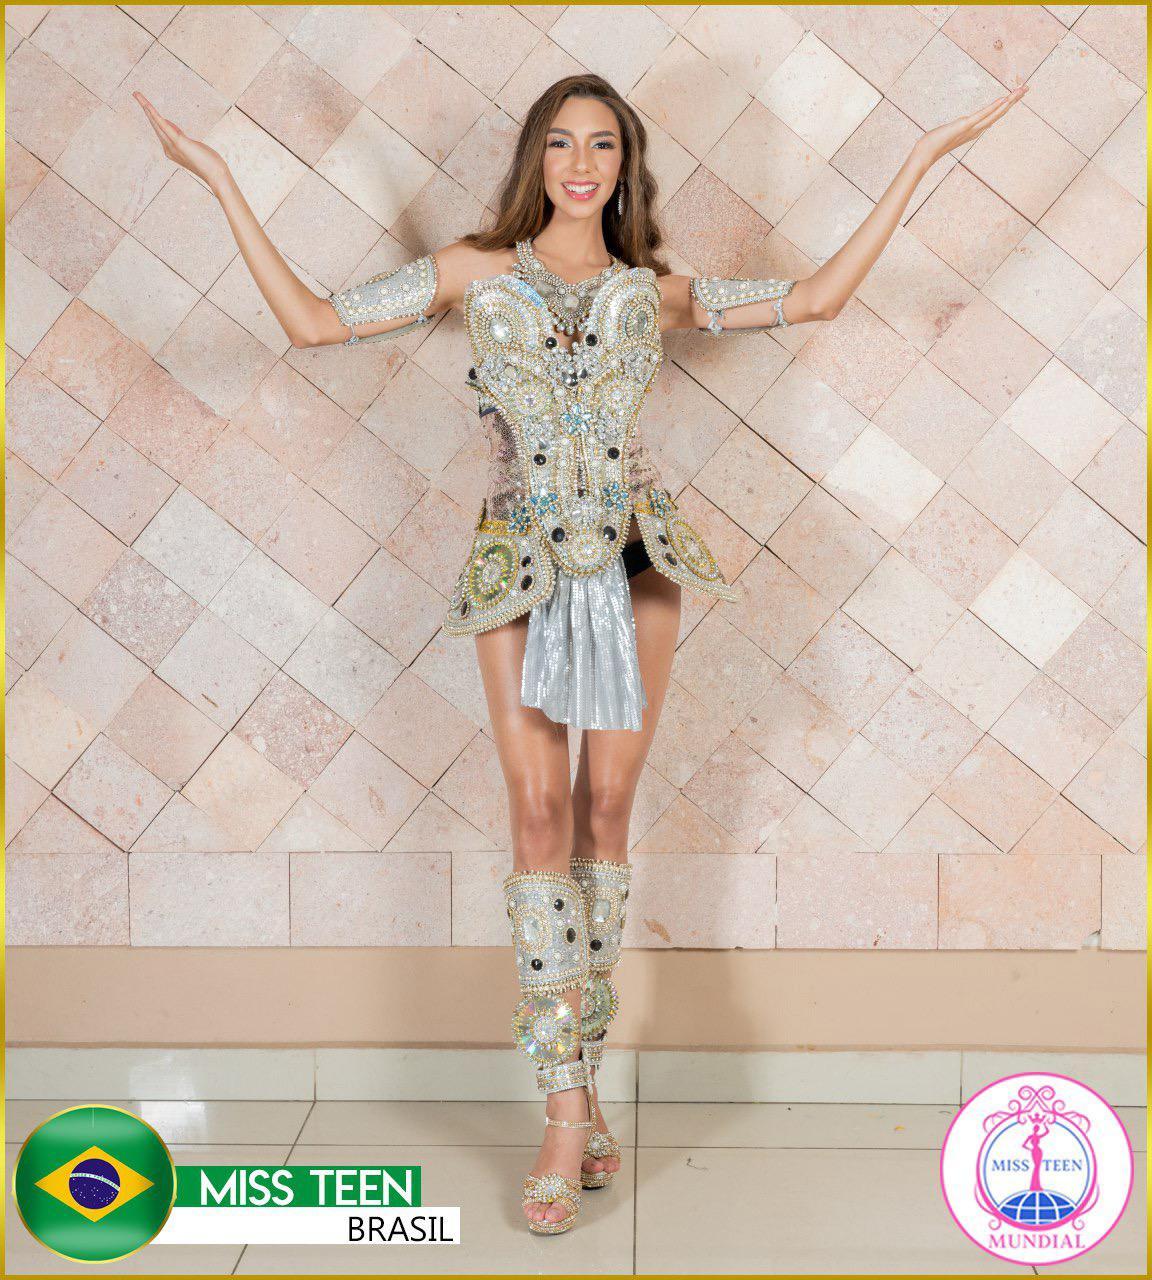 beatriz ornela, miss teen mundial brasil 2019. - Página 5 60820210